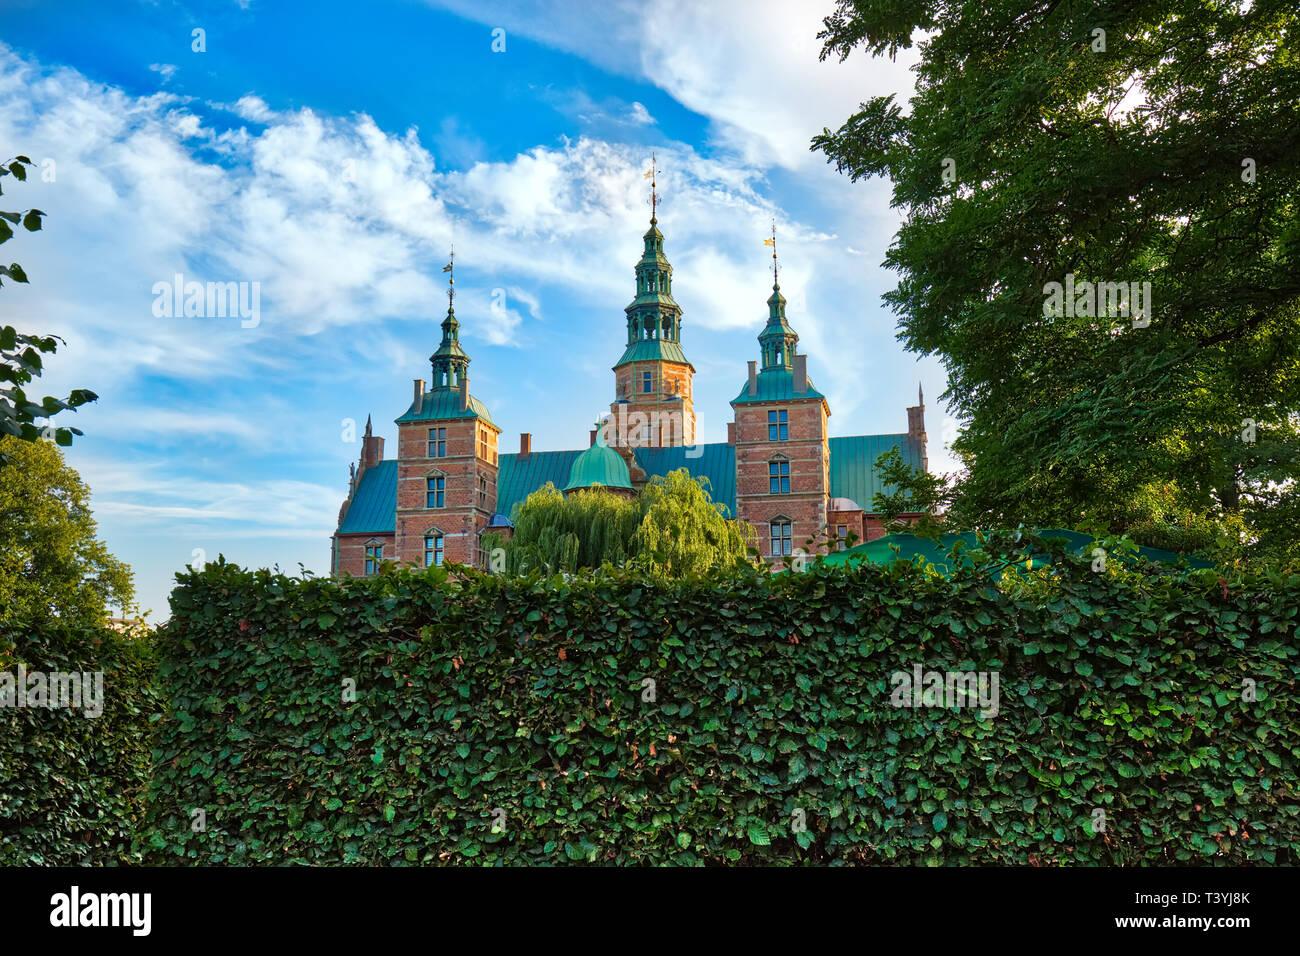 Famous Rosenborg castle, one of the most visited castles in Copenhagen - Stock Image